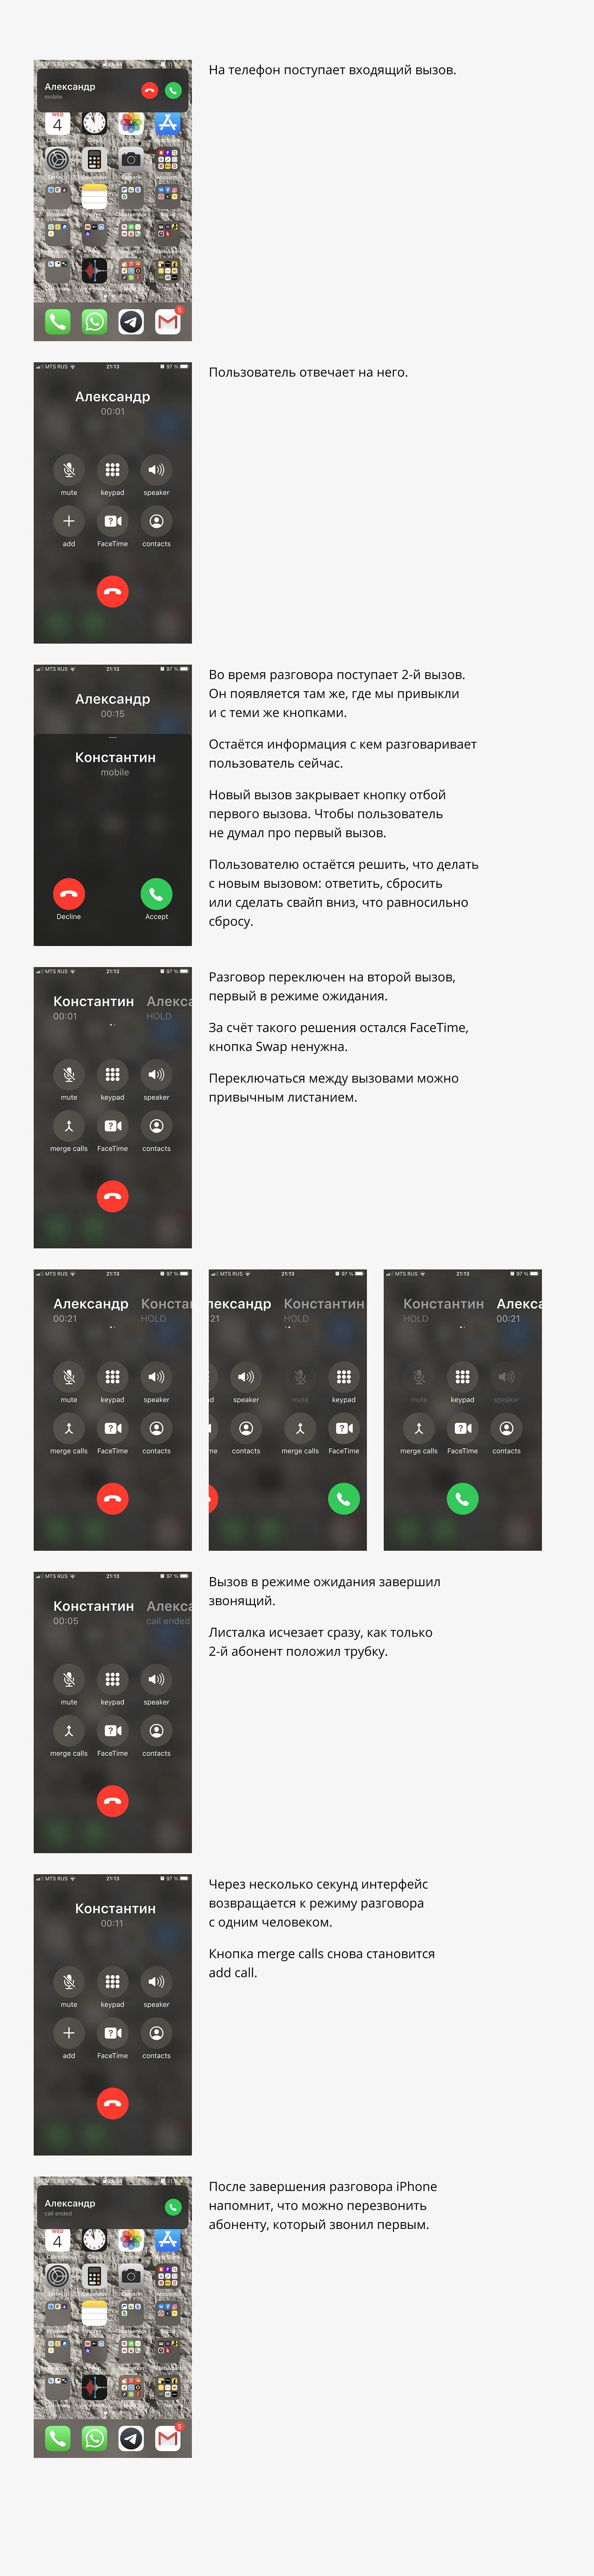 Image may contain: screenshot, black and remote